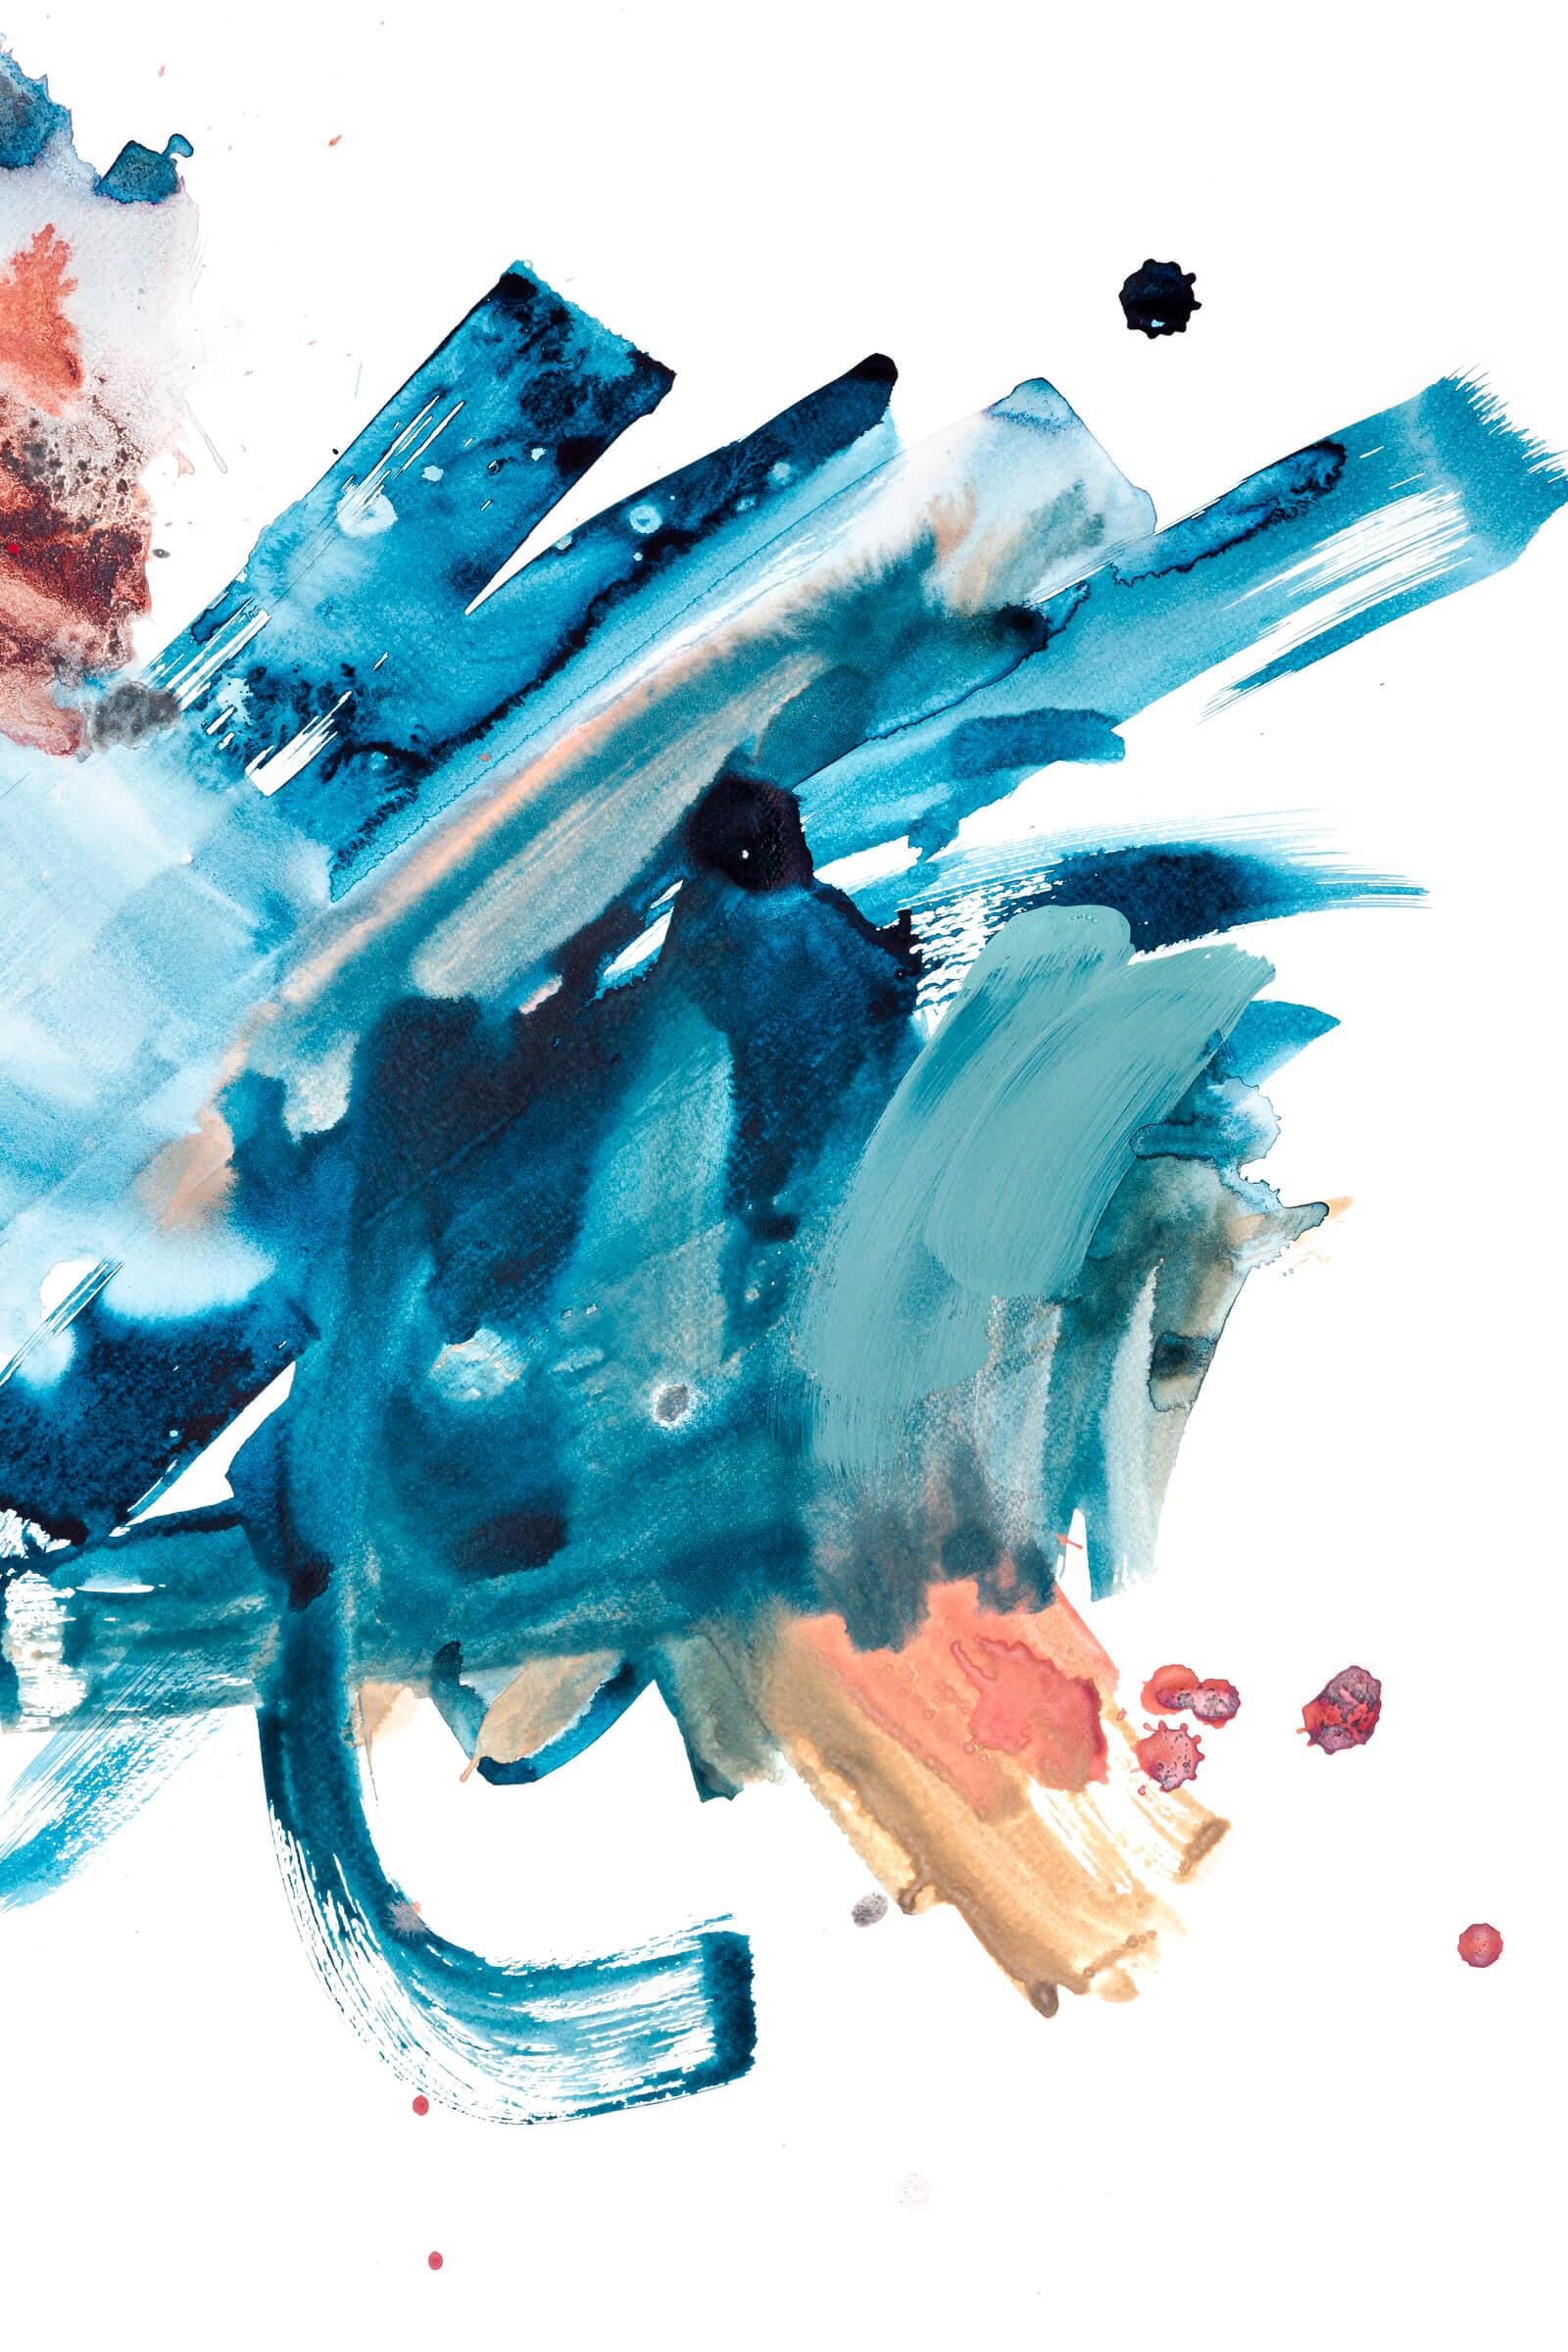 Abstrakts akvarelis